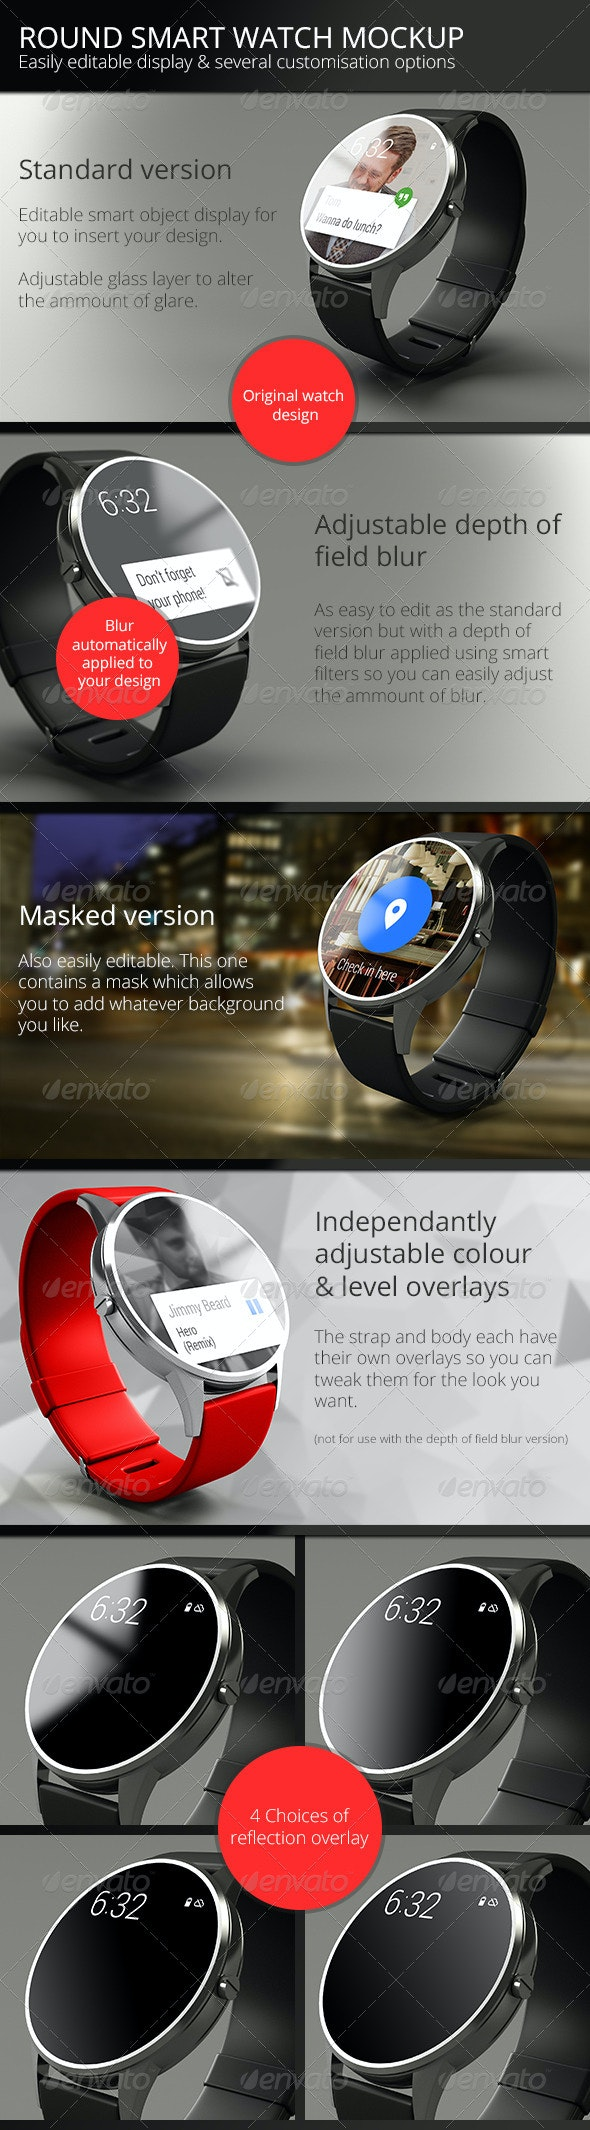 Round Smart Watch Mock-Up - Displays Product Mock-Ups